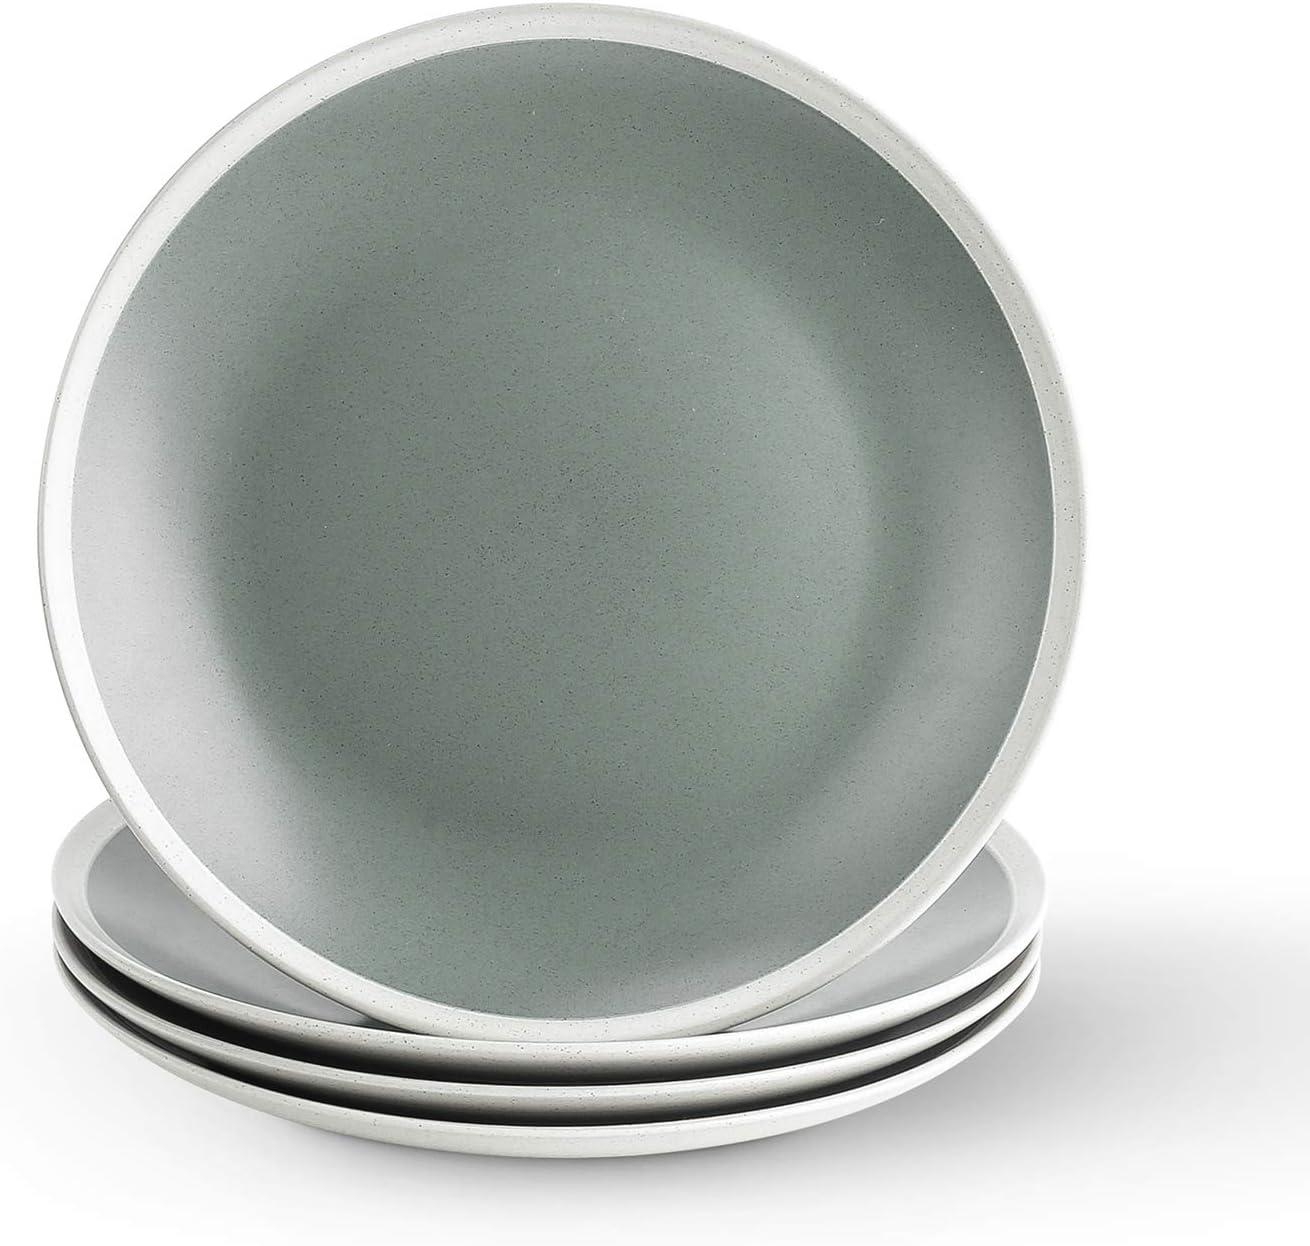 Stone lain Serenity Stoneware Dish Max 50% OFF Set Plates Dinner Green a 4 Nippon regular agency